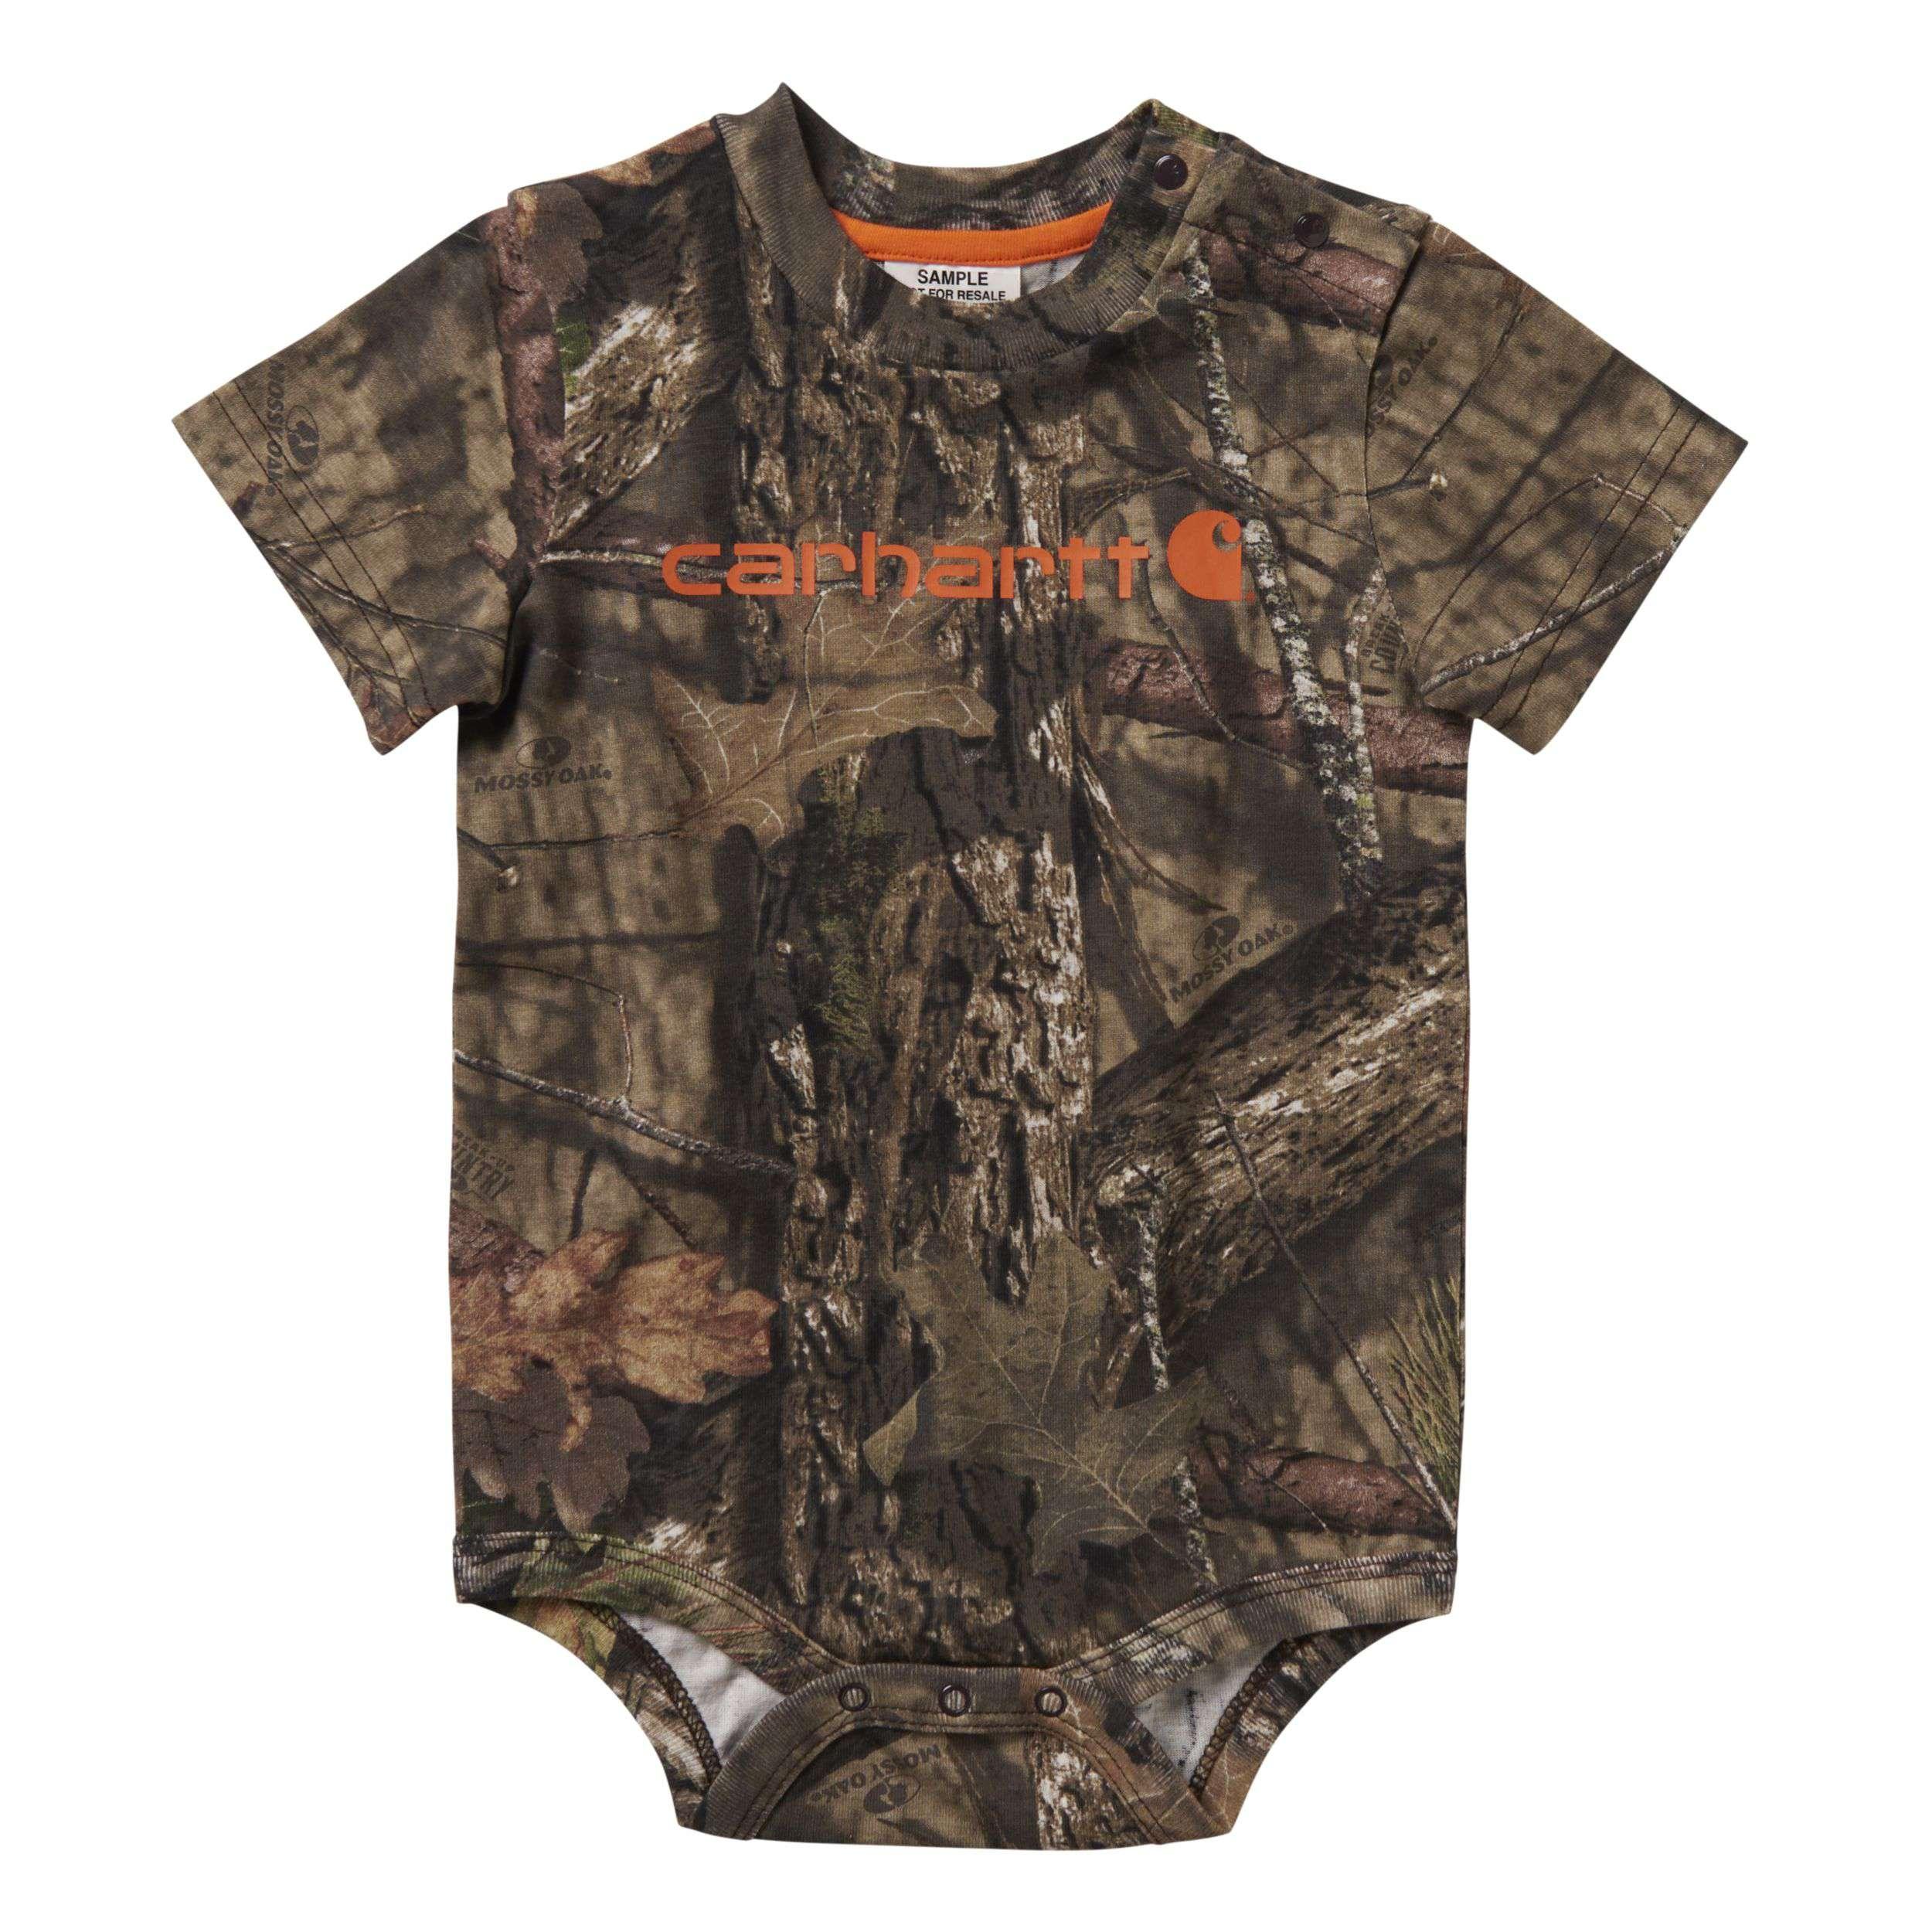 Carhartt Camo Bodyshirt